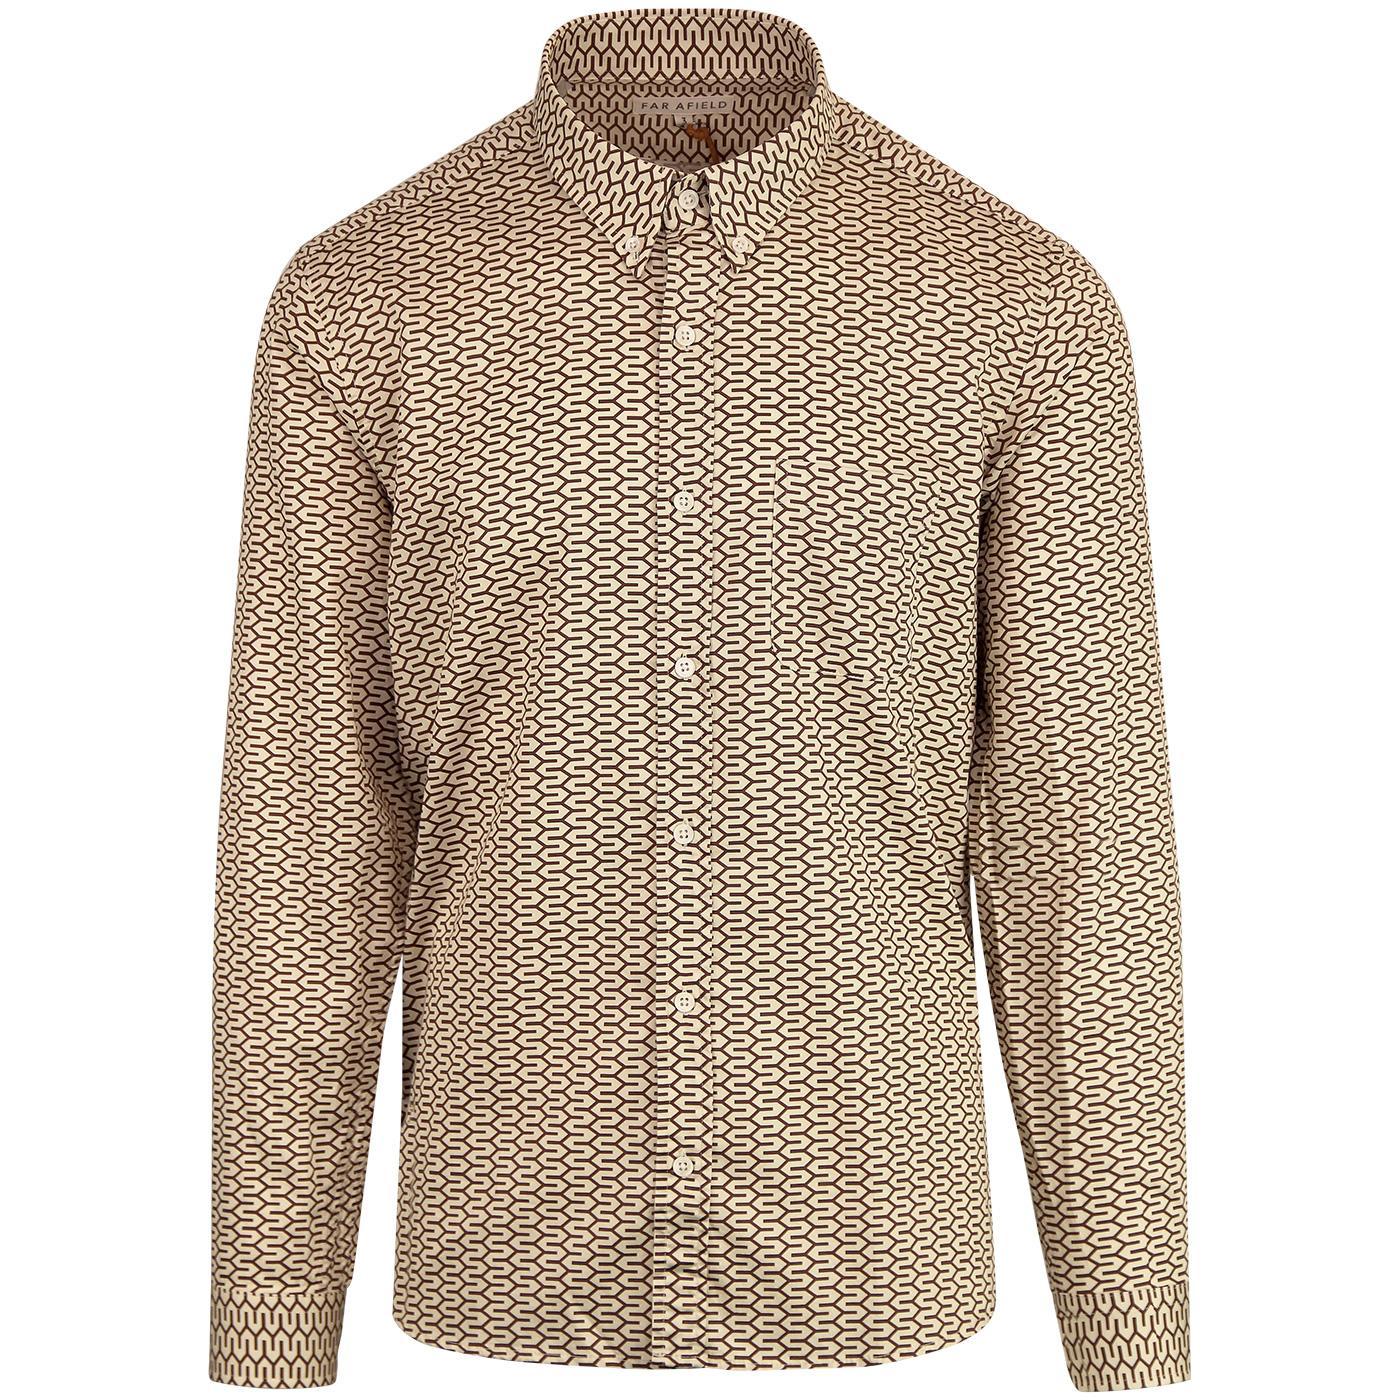 Renold FAR AFIELD Retro 70s Geometric Mod Shirt